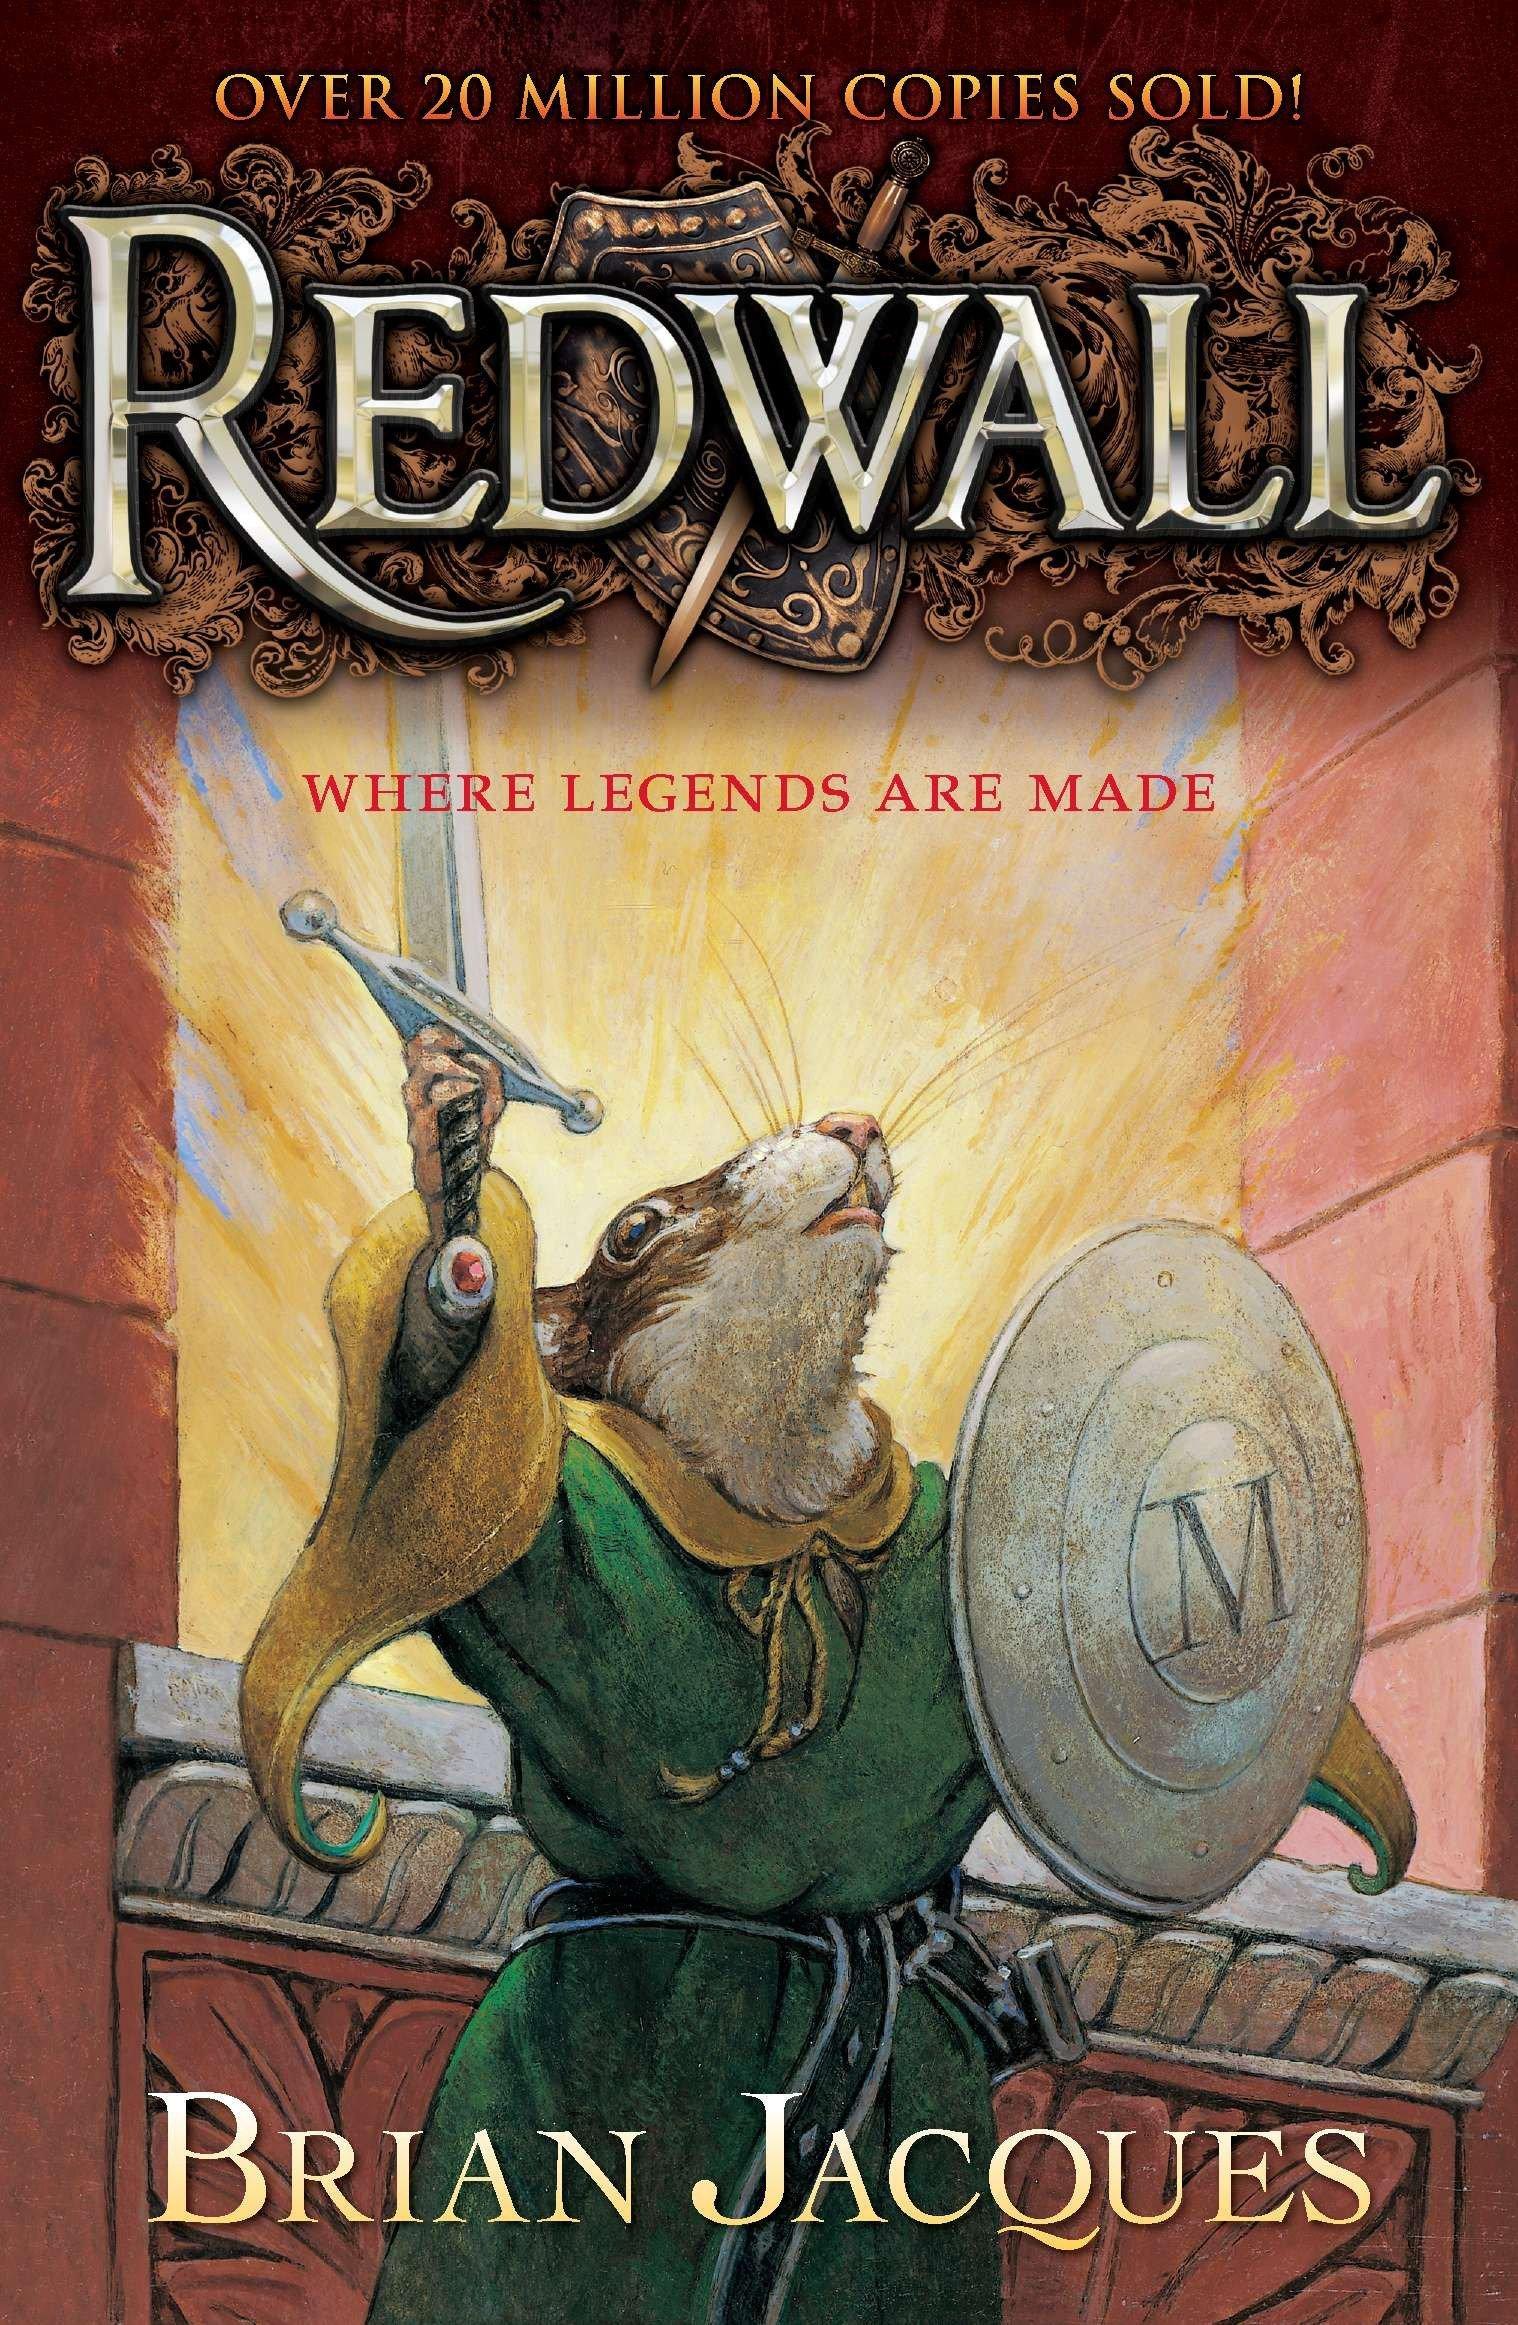 Amazon.com: Redwall (9780142302378): Jacques, Brian, Chalk, Gary: Books